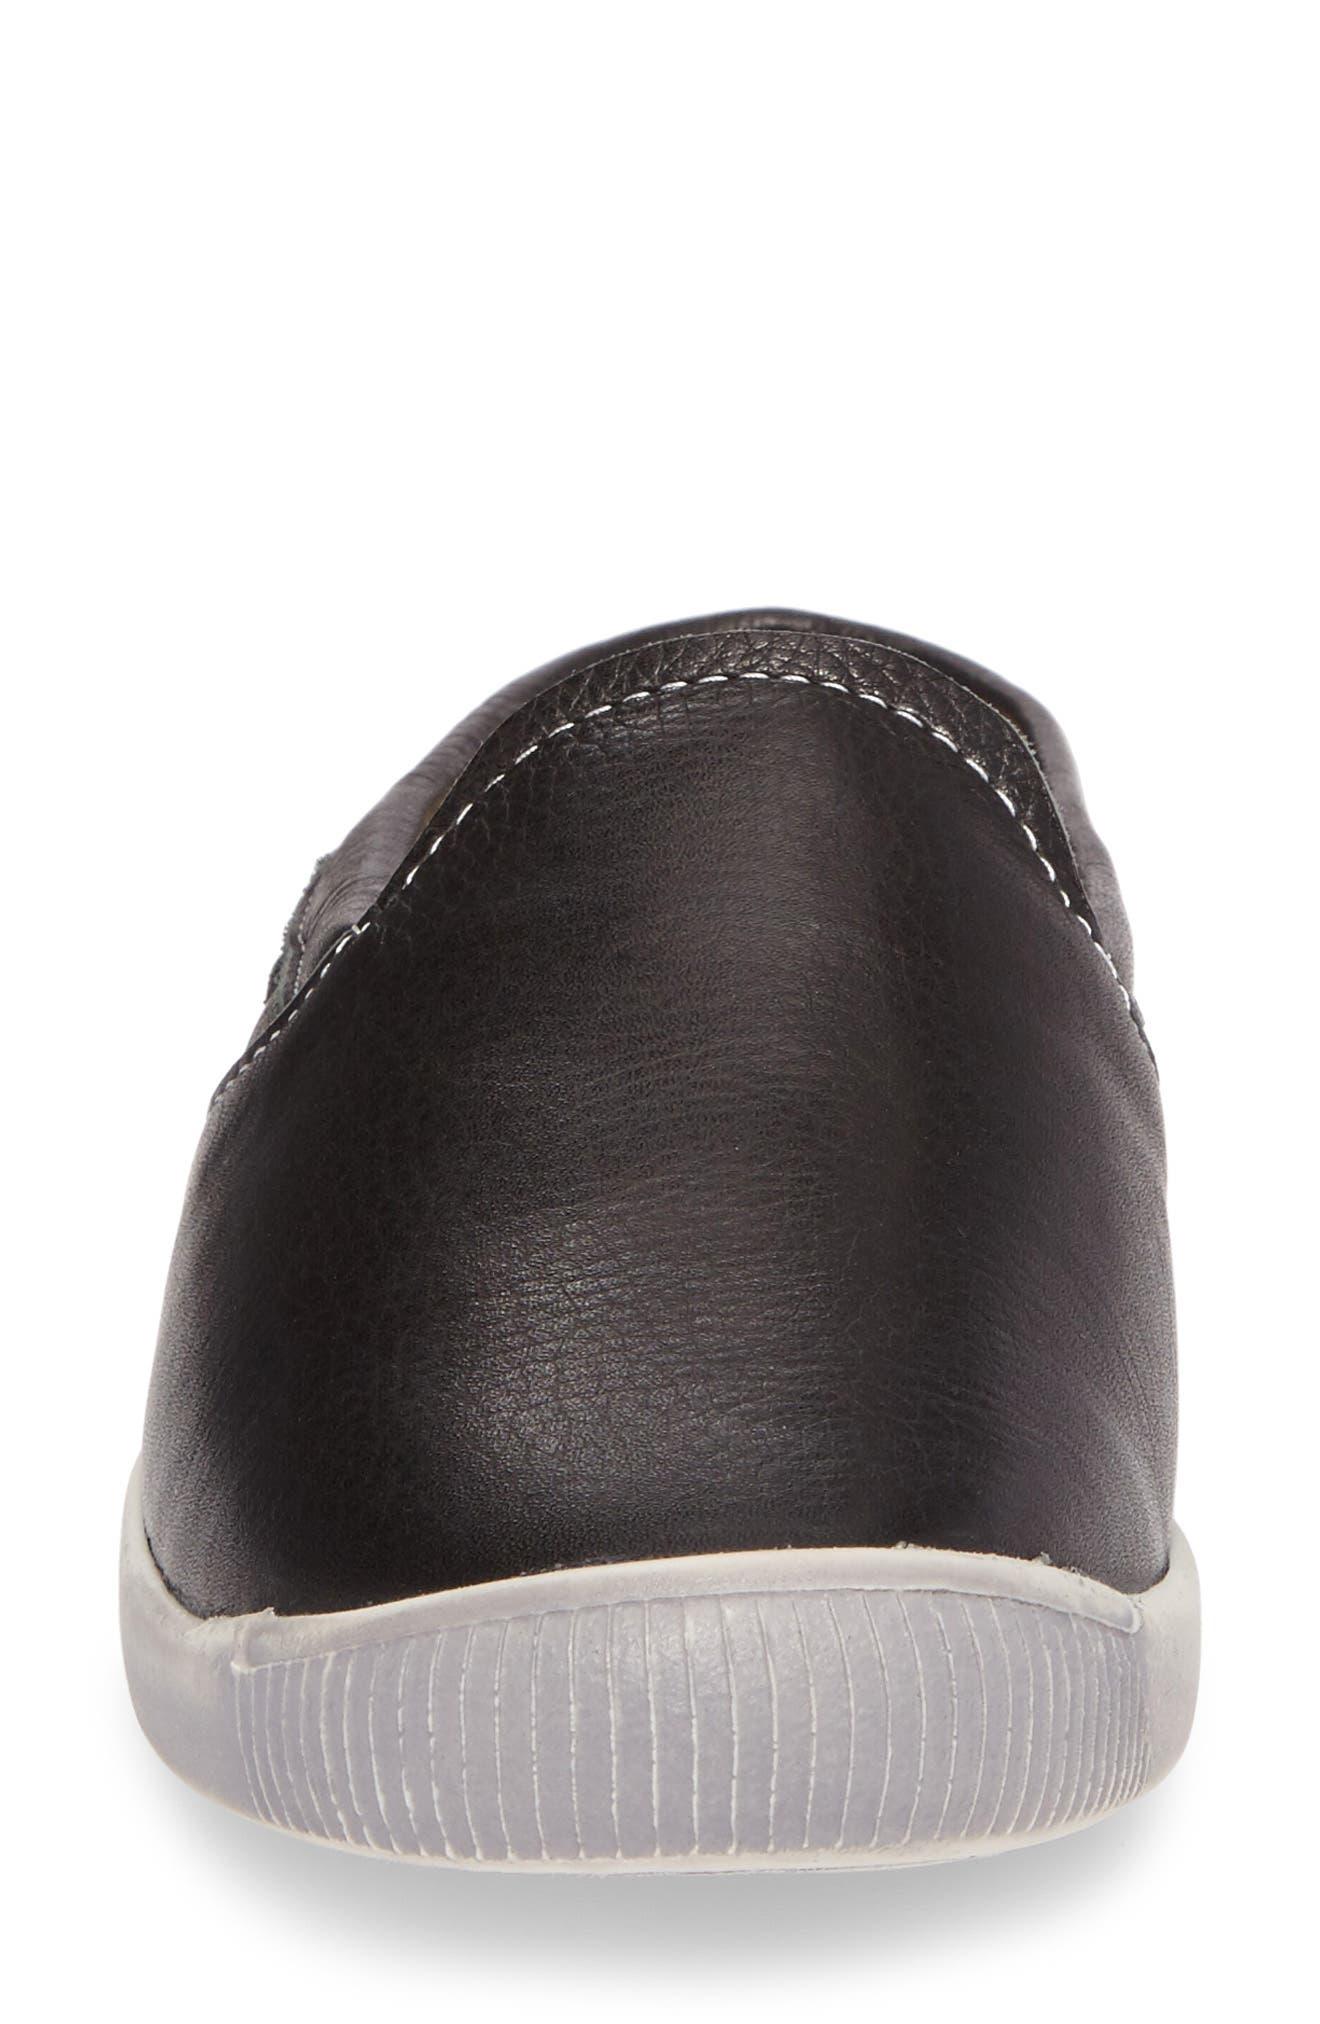 Imo Sneaker Mule,                             Alternate thumbnail 4, color,                             001